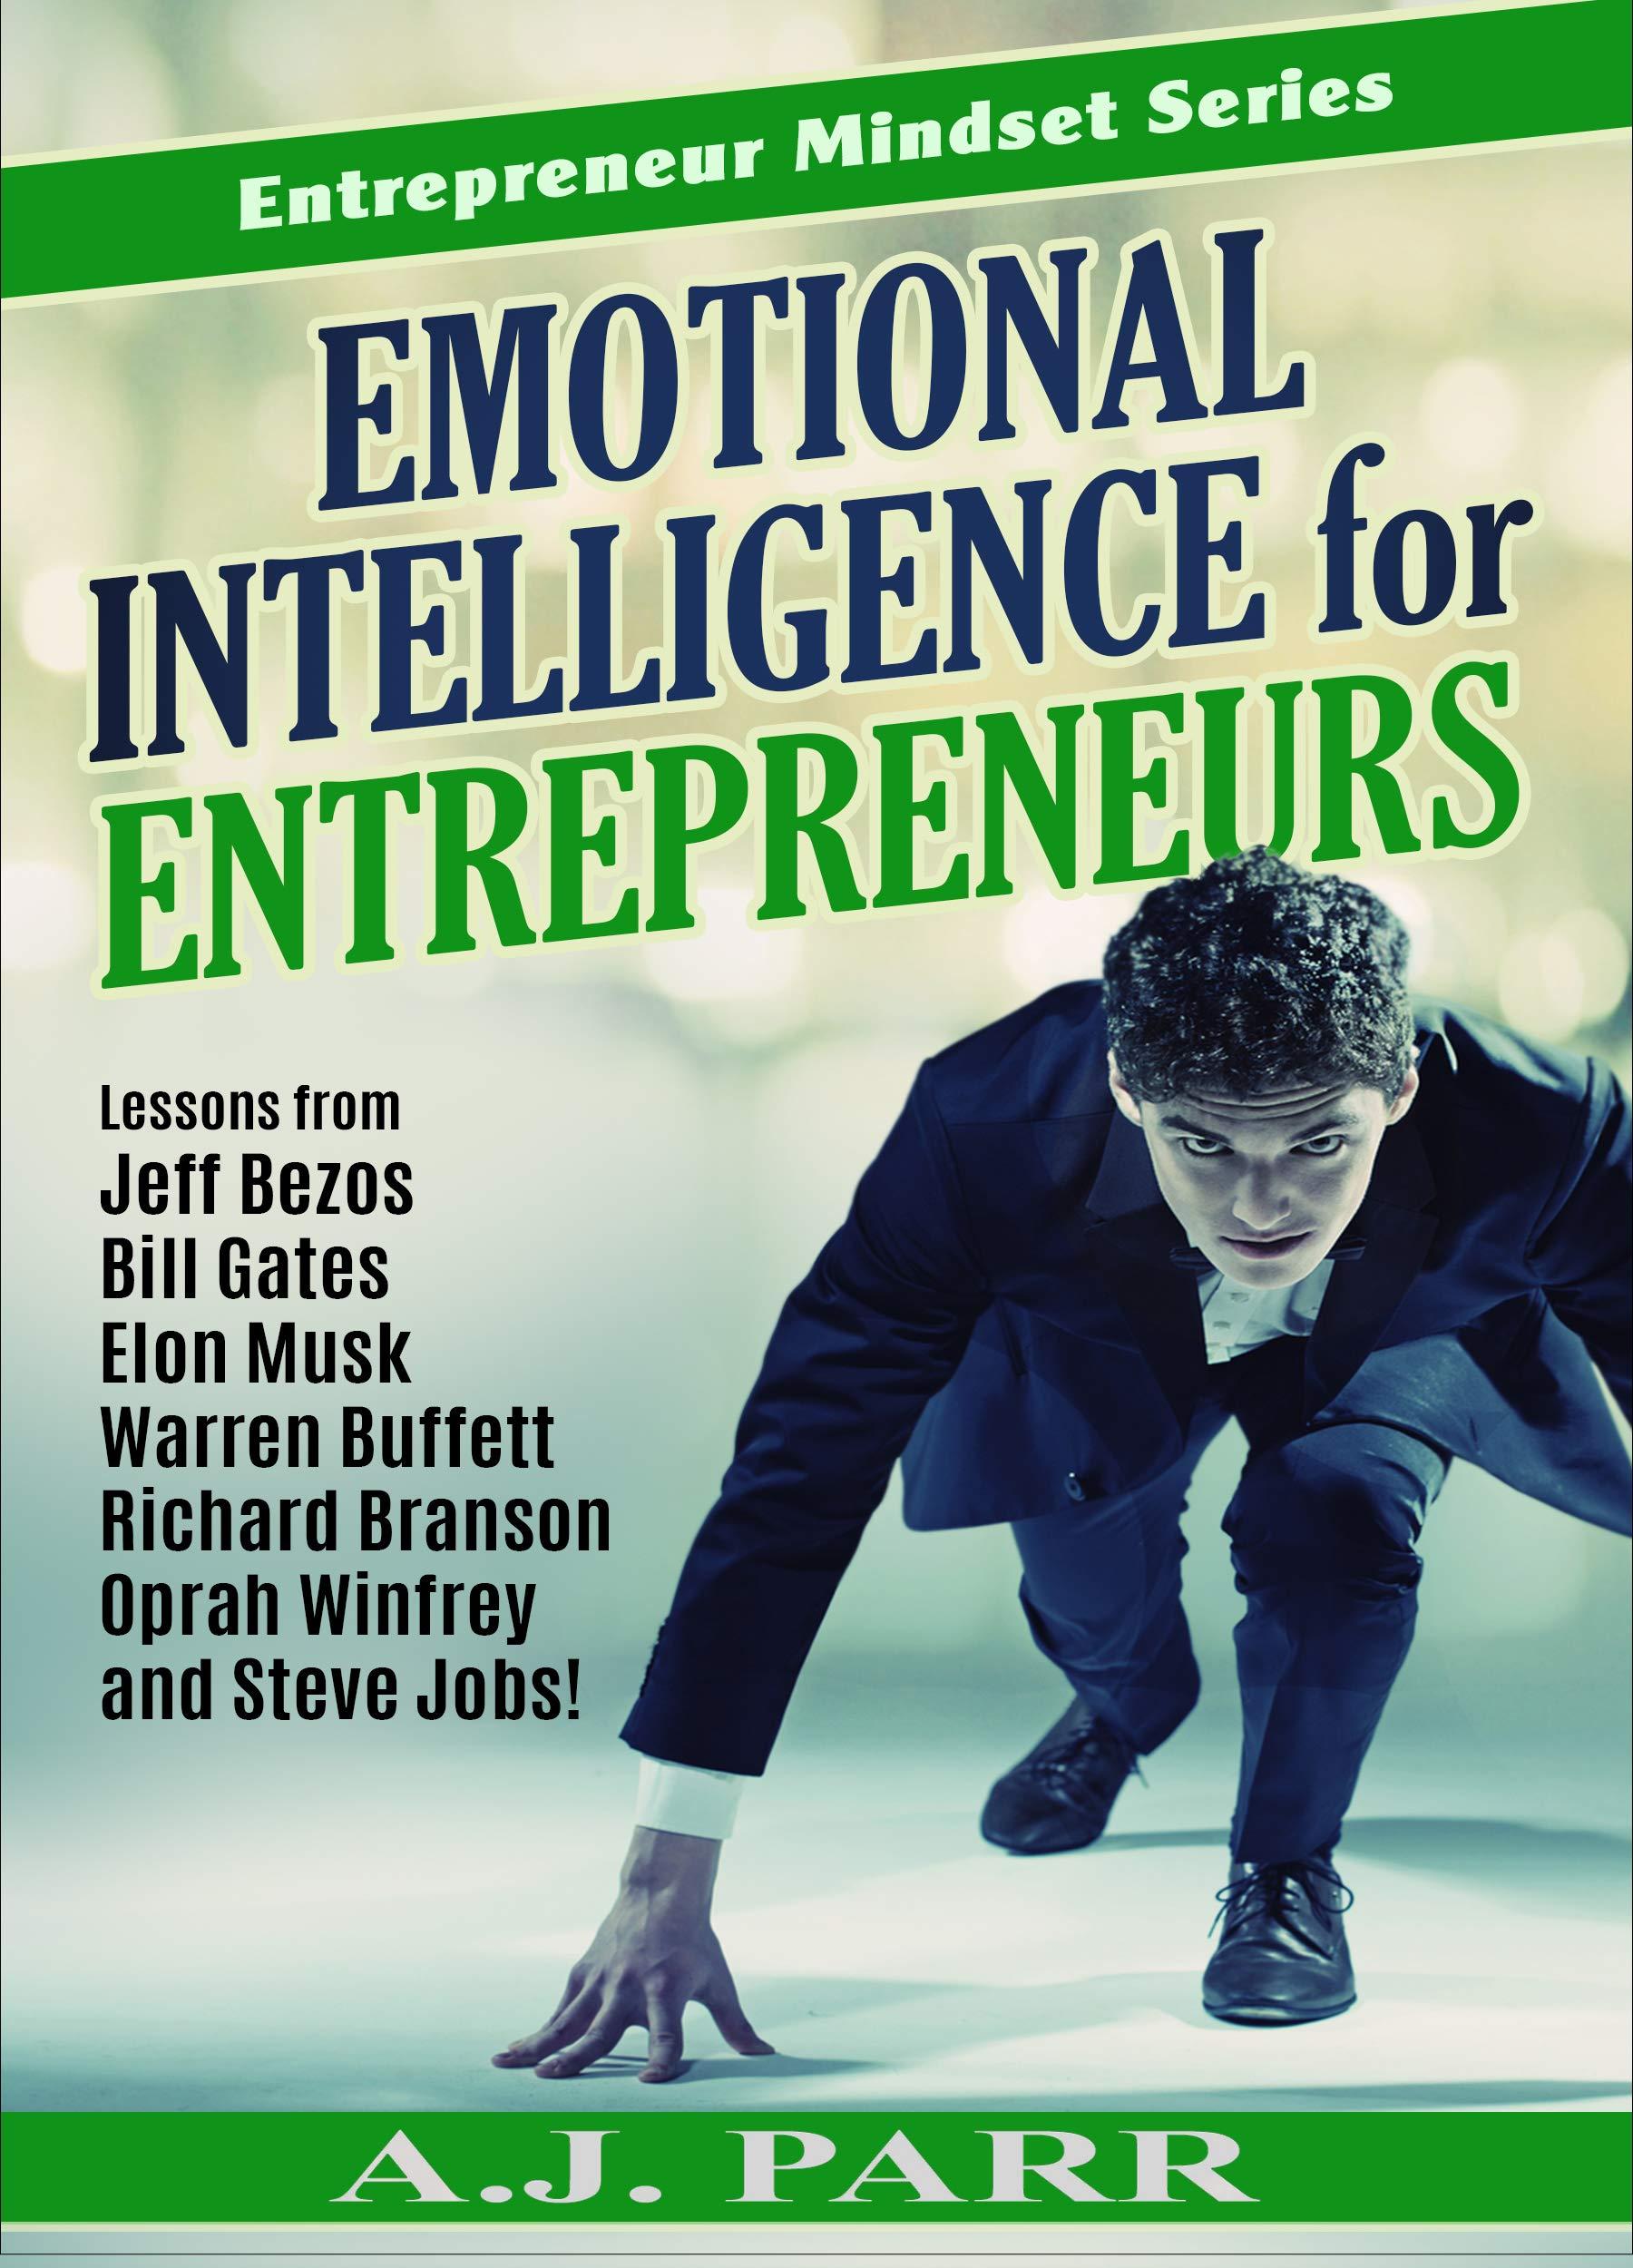 EMOTIONAL INTELLIGENCE FOR ENTREPRENEURS : Lessons from Jeff Bezos, Bill Gates, Elon Musk, Warren Buffett, Richard Branson, Oprah Winfrey, and Steve Jobs (Entrepreneur Mindset Series Book 3)